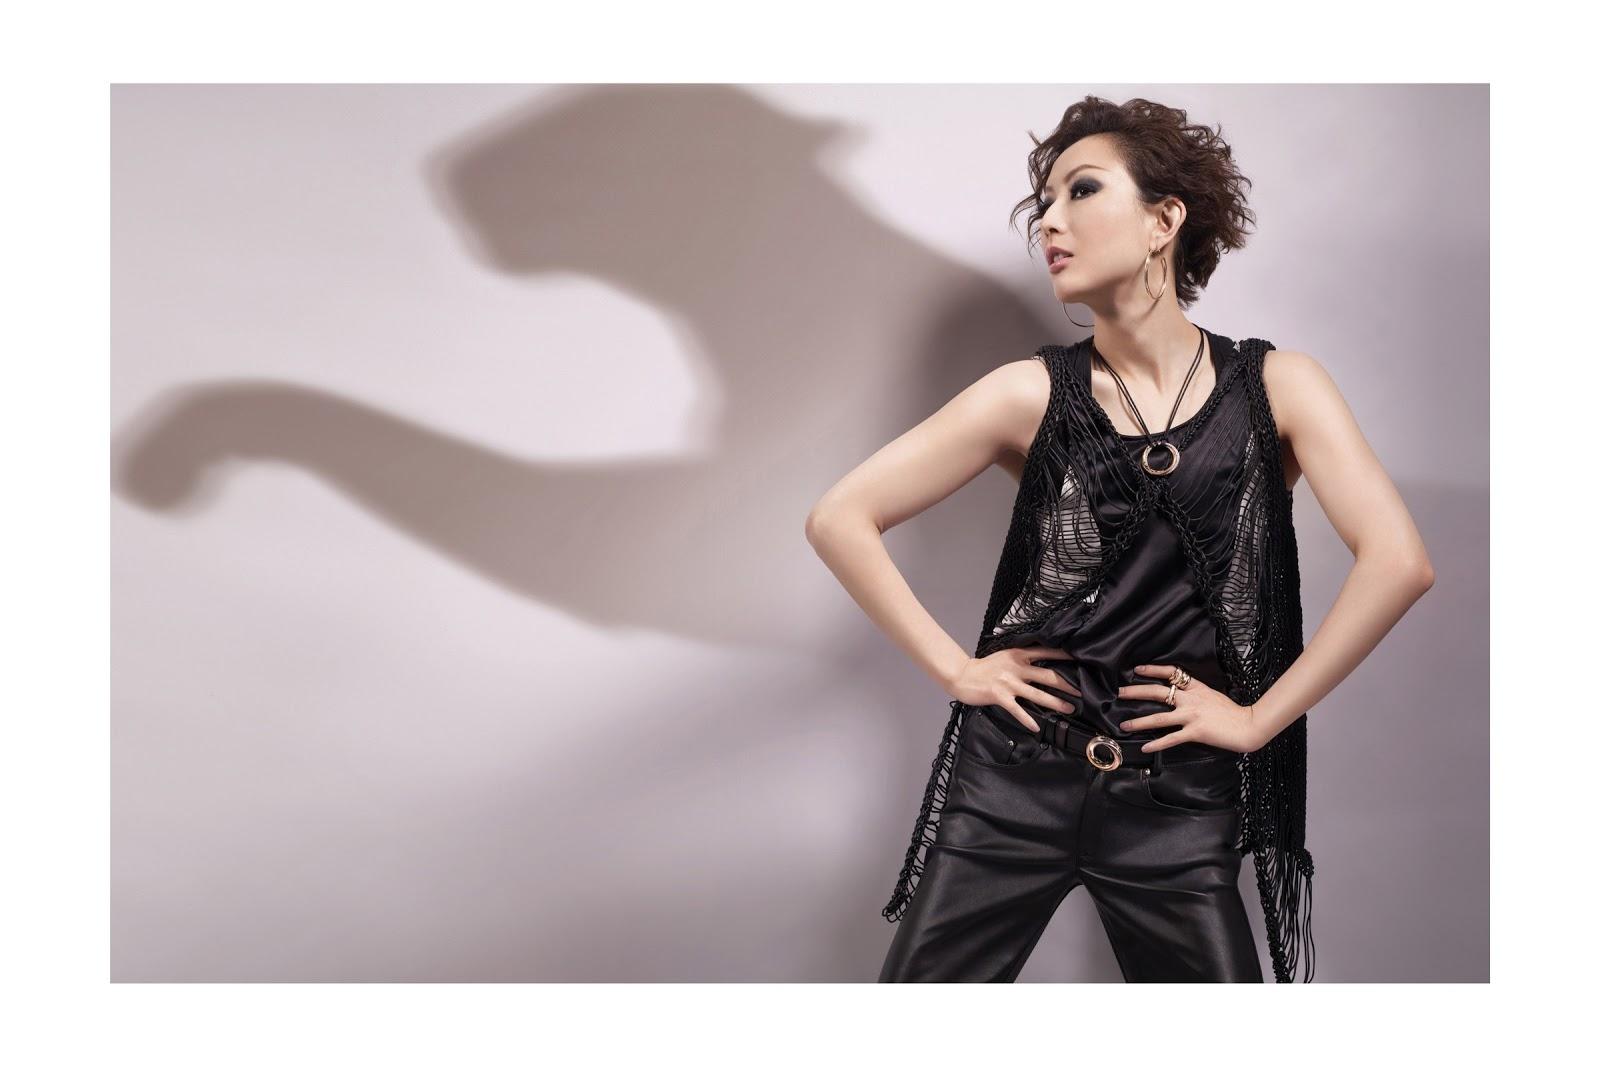 Edison Chen - Wikipedia Sammi cheng fashion style